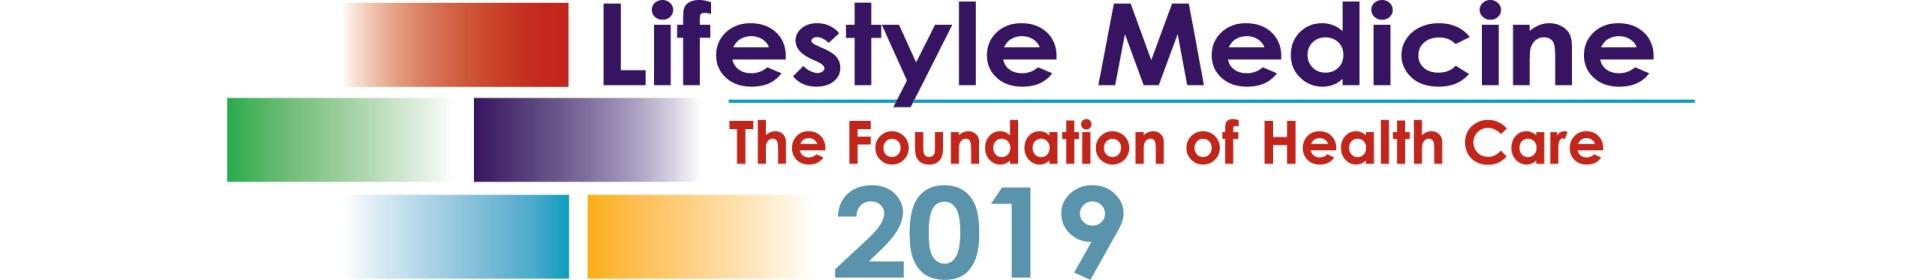 Lifestyle Medicine 2019 Event Banner